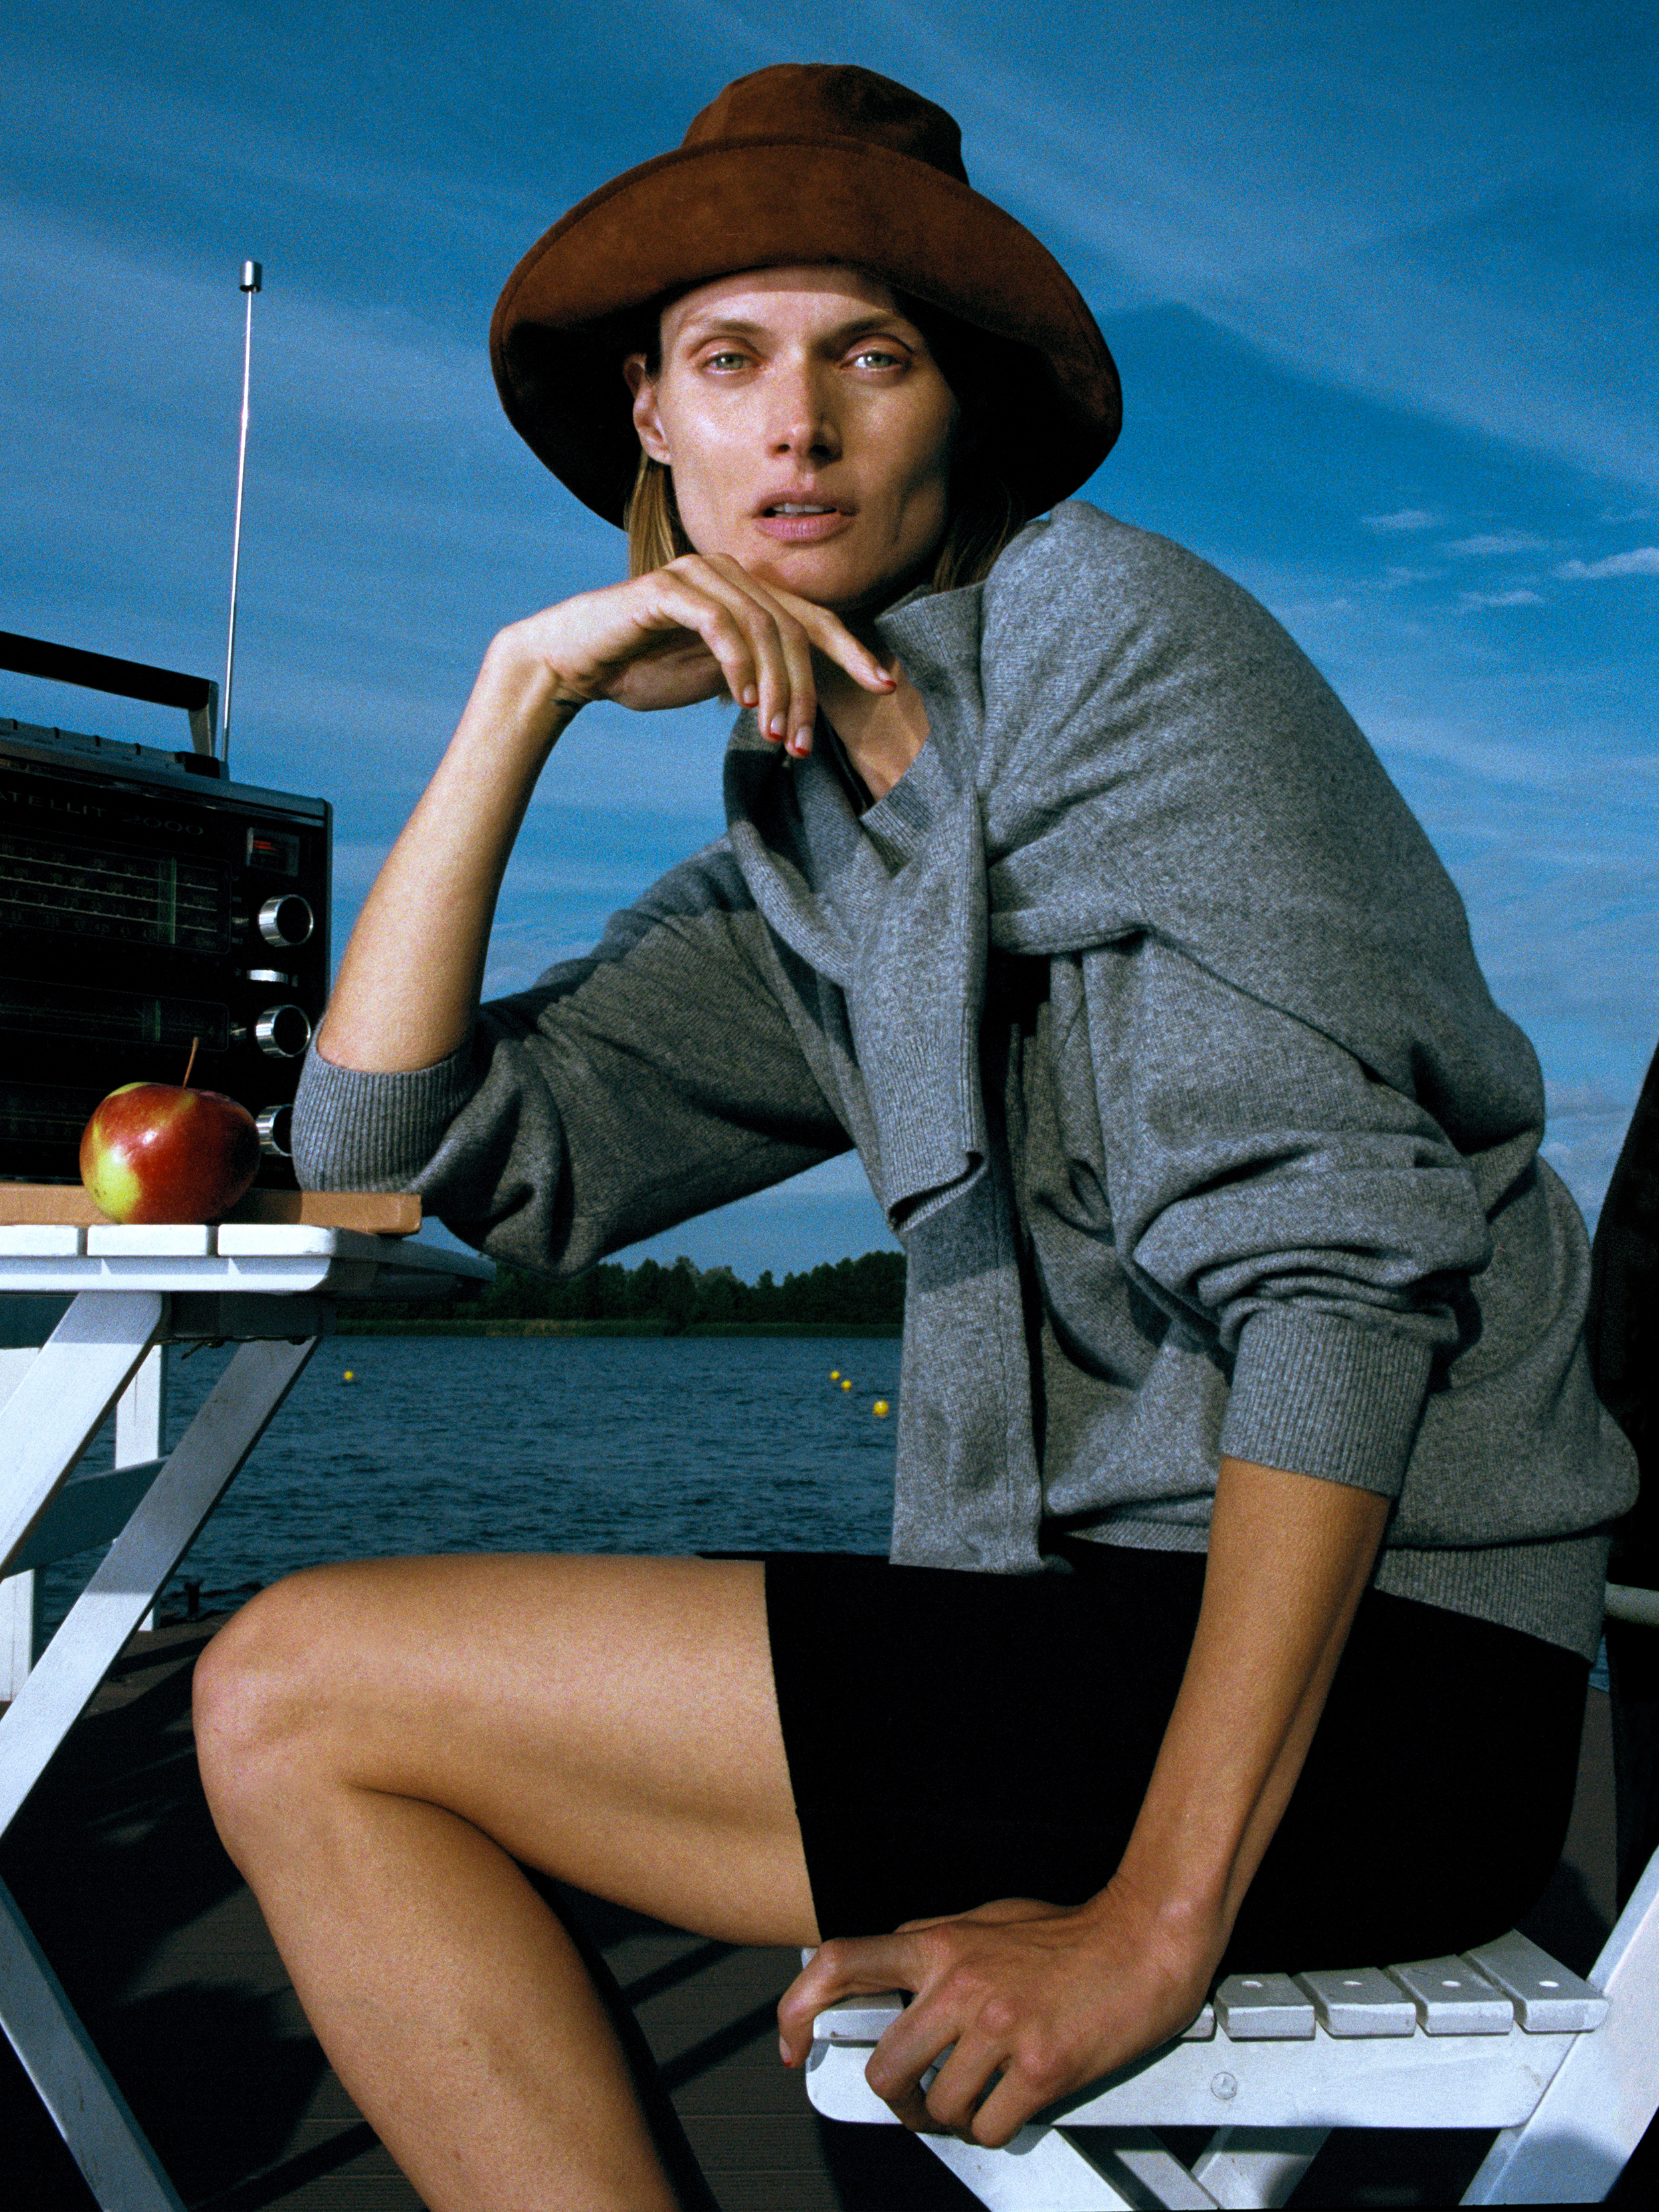 10df68a1490 Tessa Thompson On Creed, Thor, Race, Sexuality & Janelle Monae | PORTER